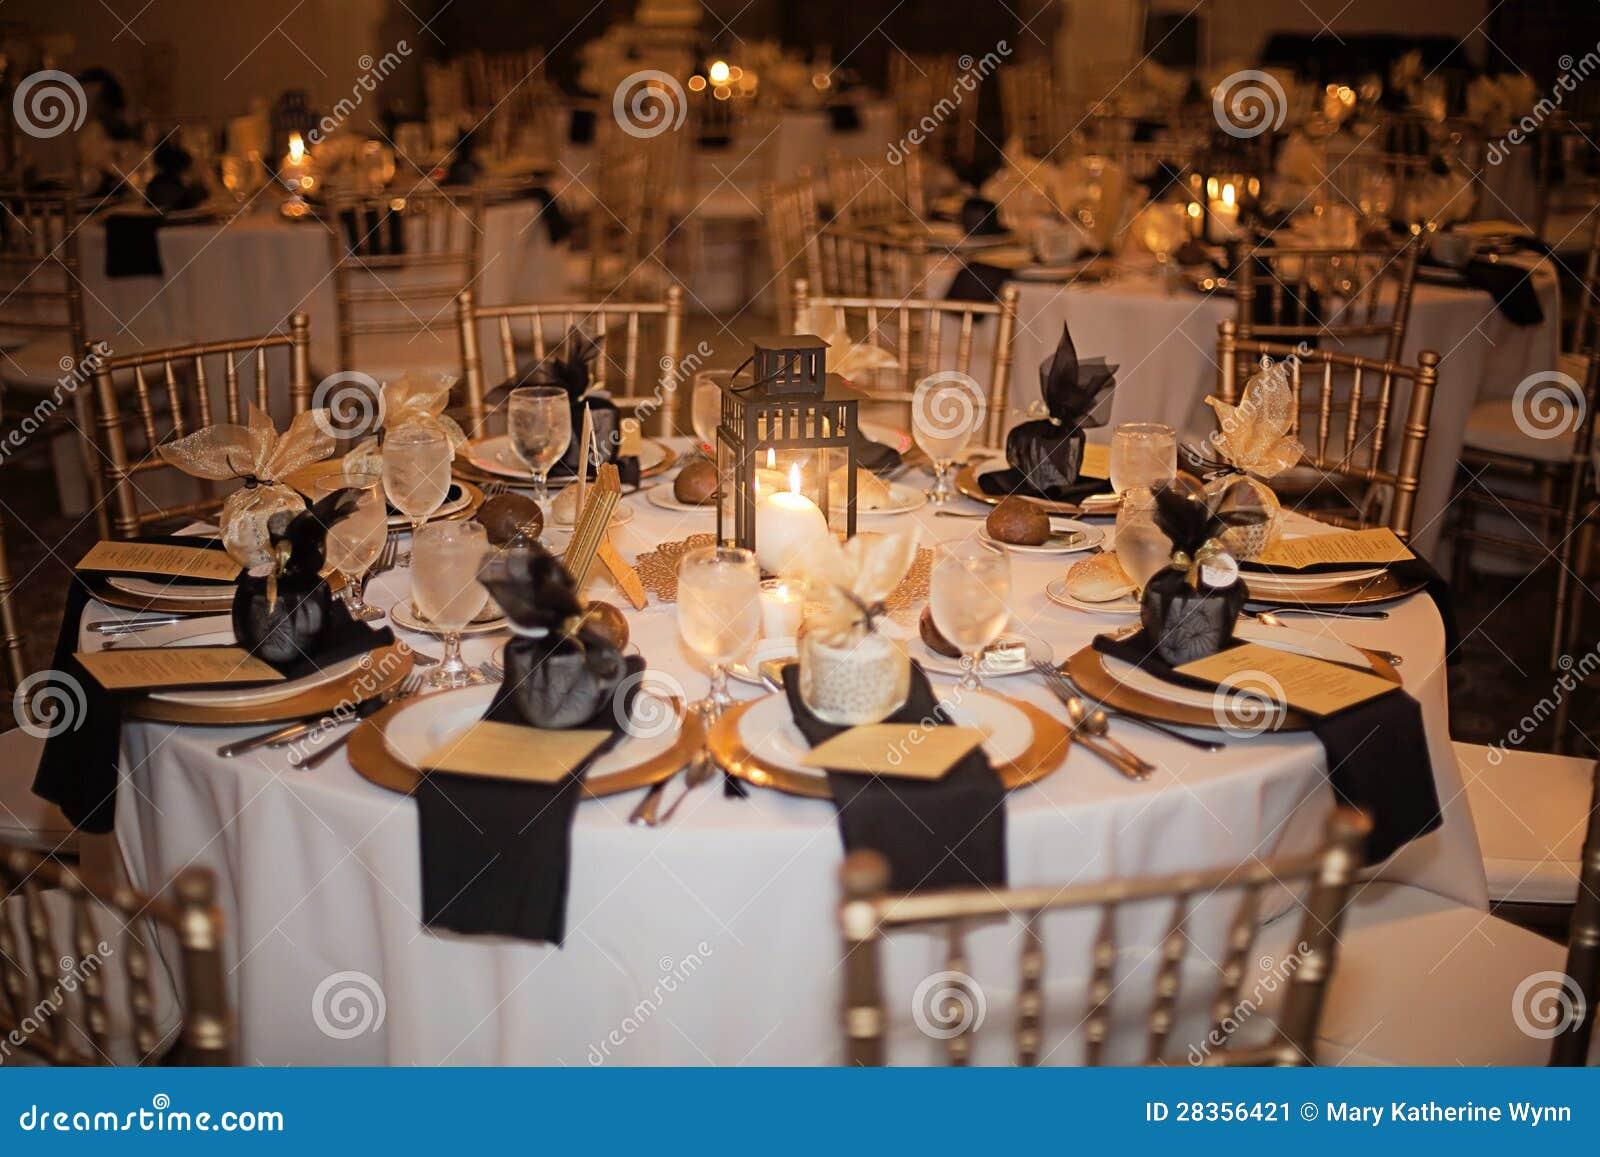 Wedding Reception Venue At Night Stock Image Image 28356421